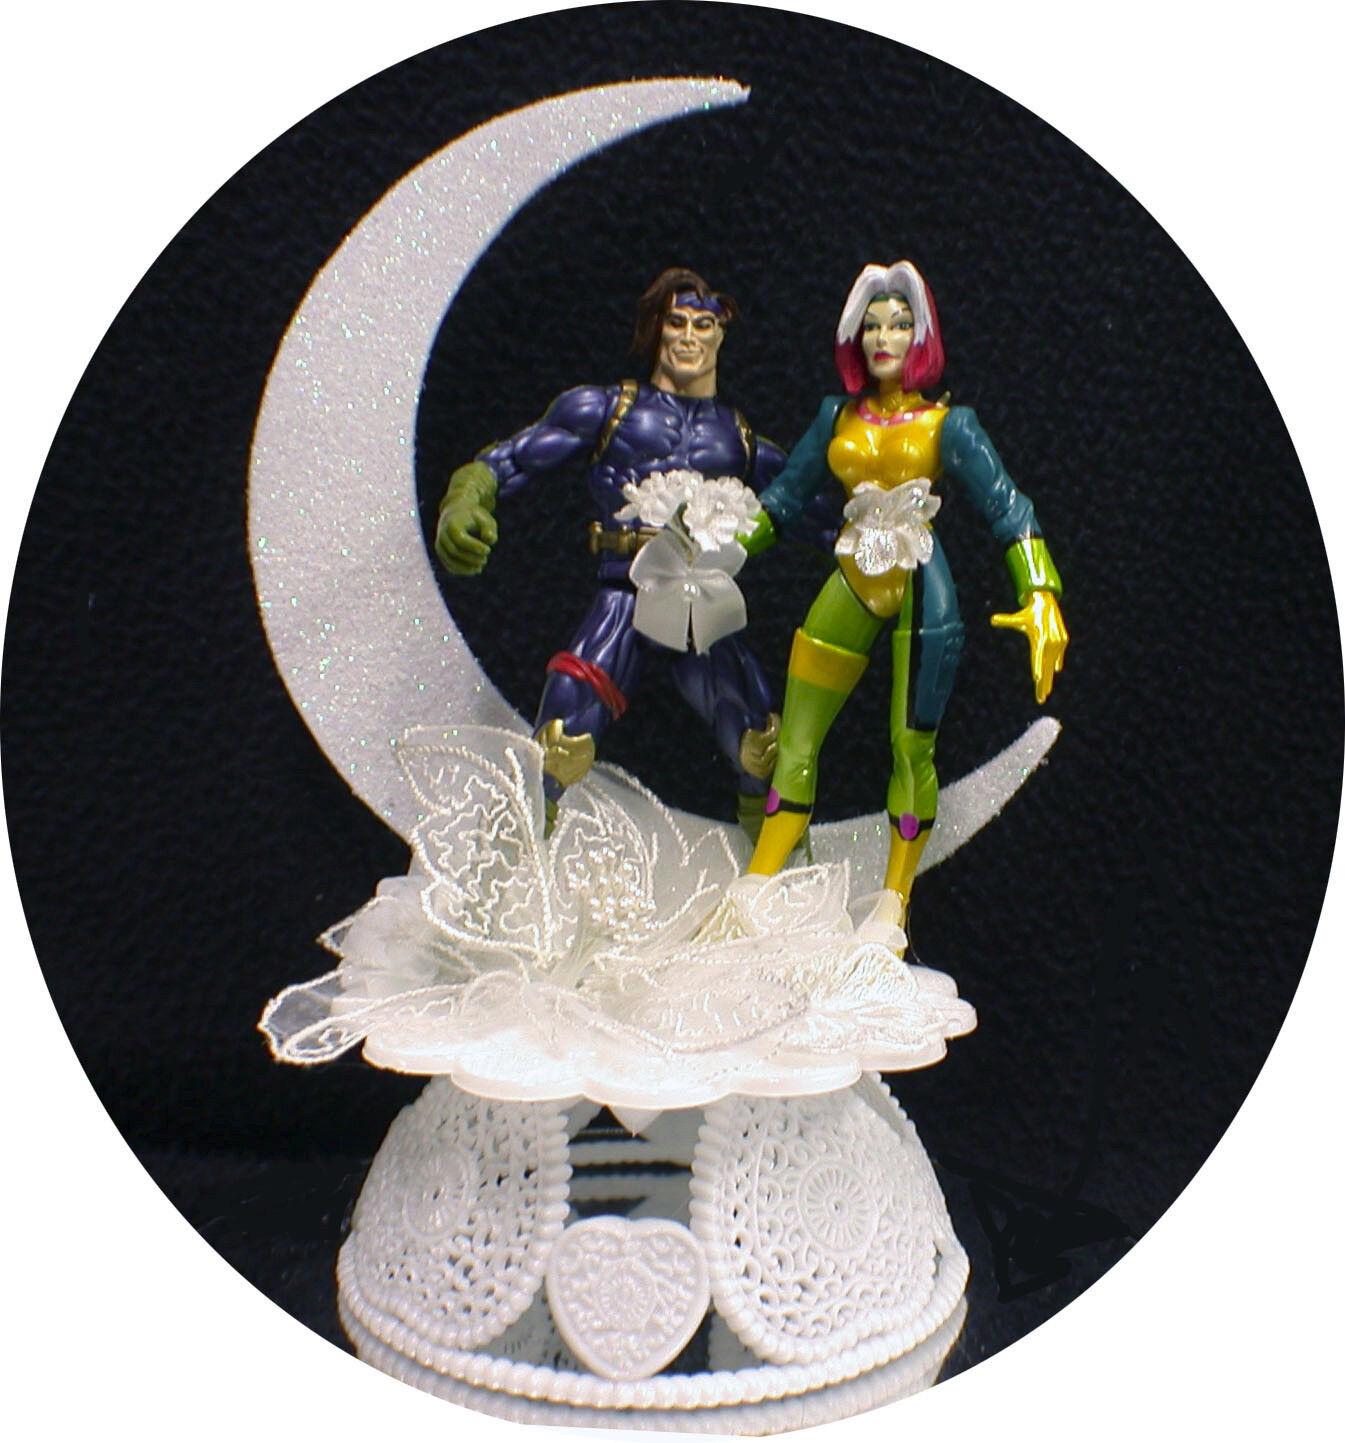 Gambit & Rogue Marvel Comic Wedding Cake Topper Groom funny super hero